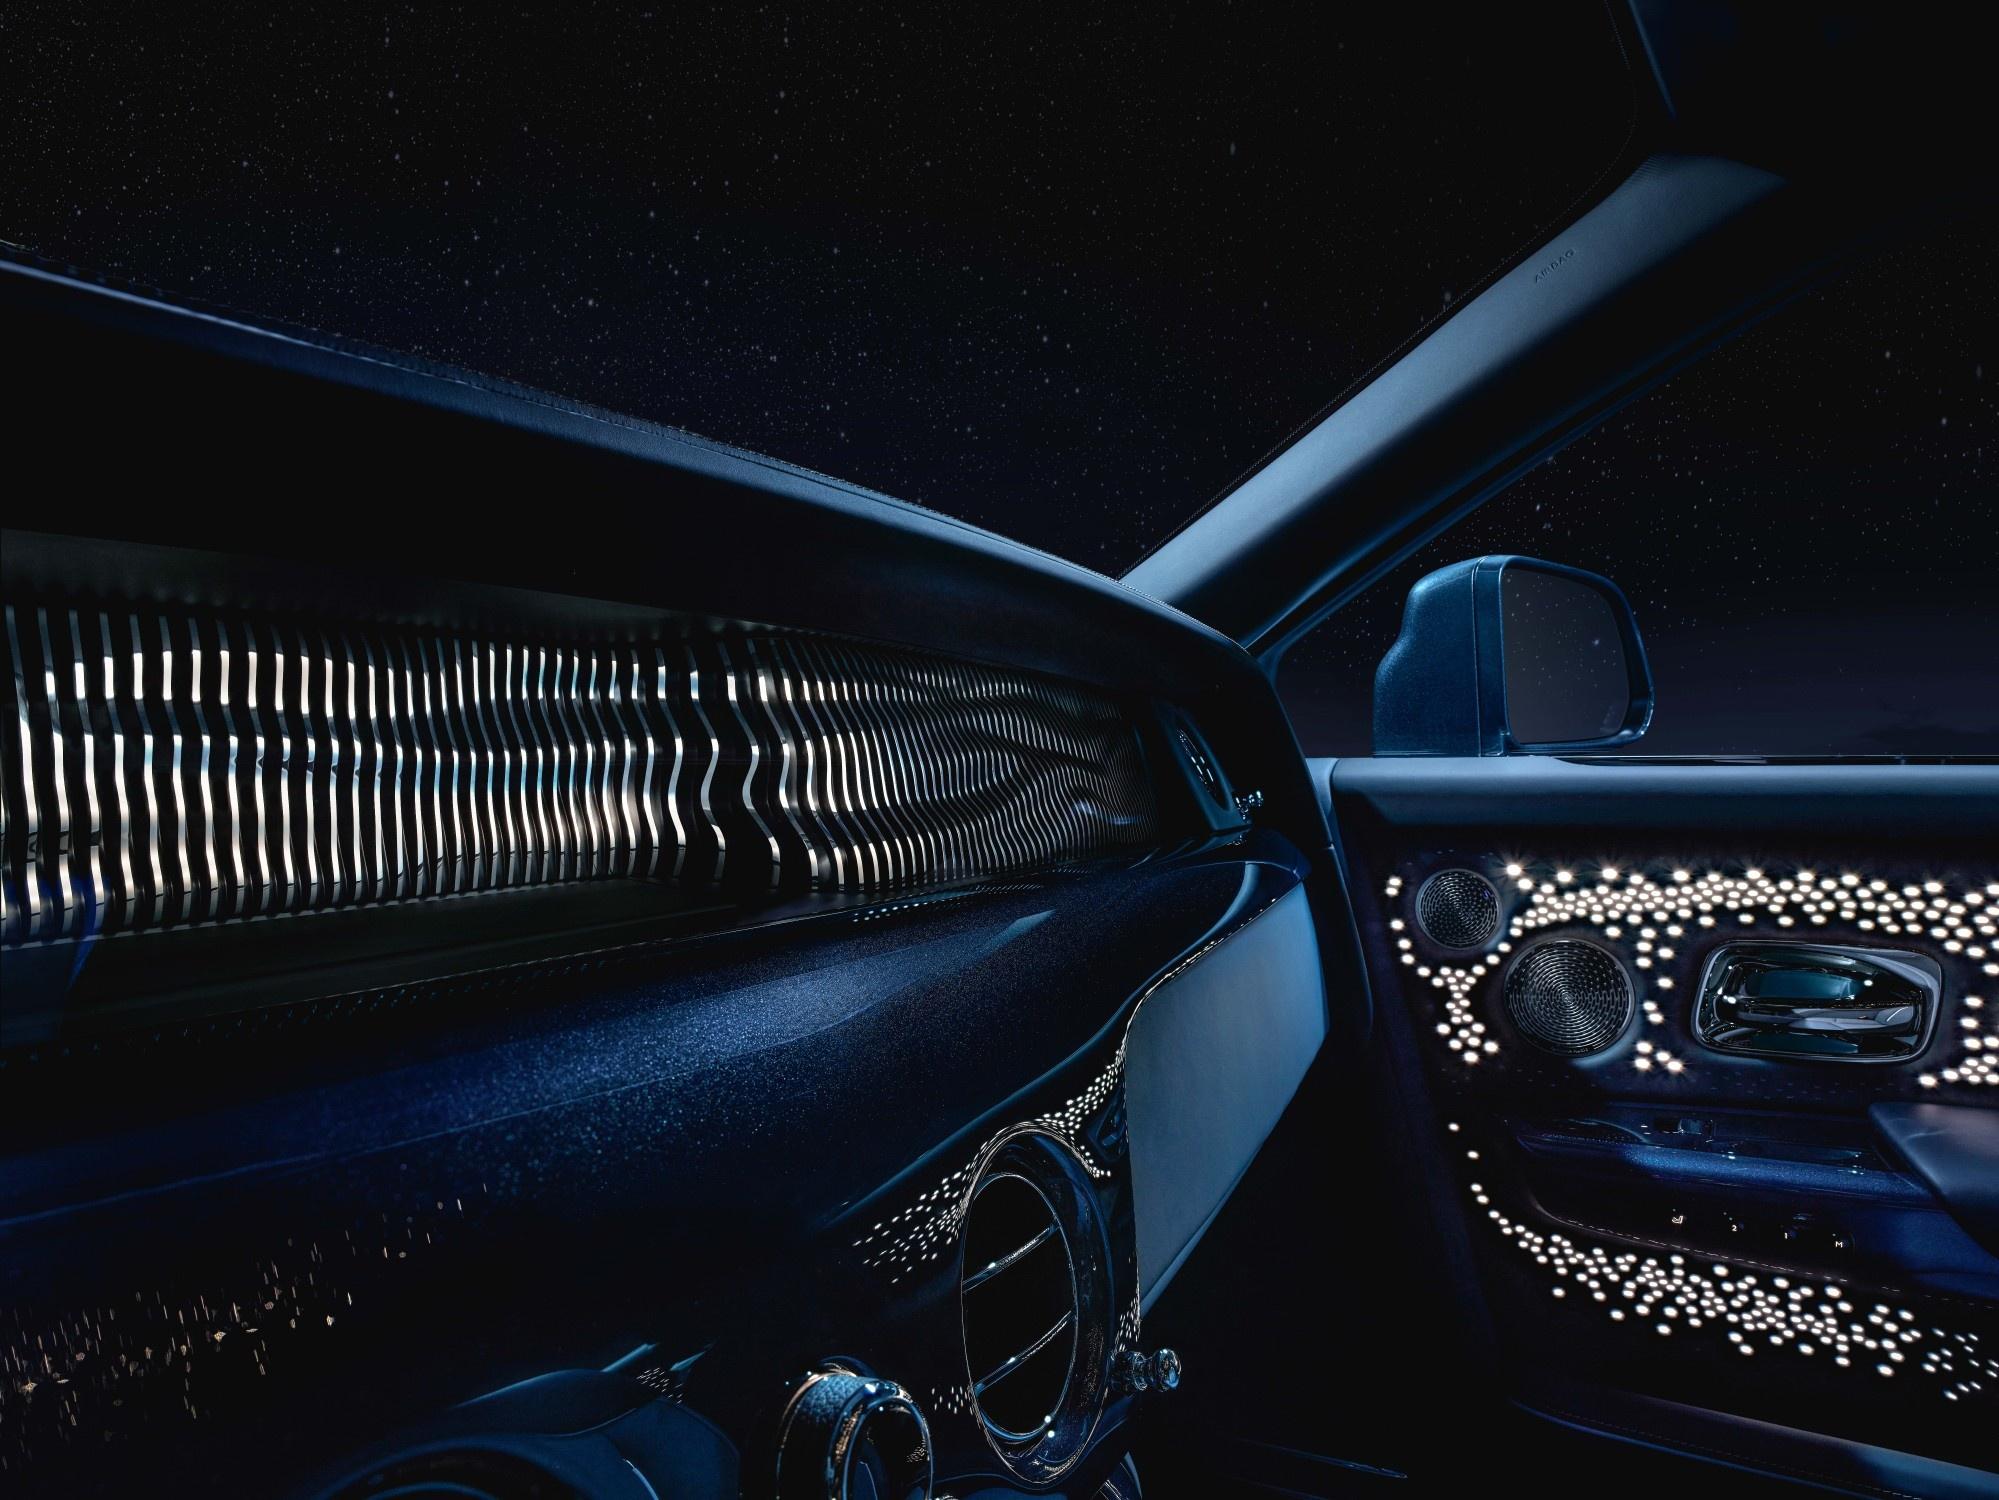 ban dac biet Rolls-Royce Phantom Tempus anh 8